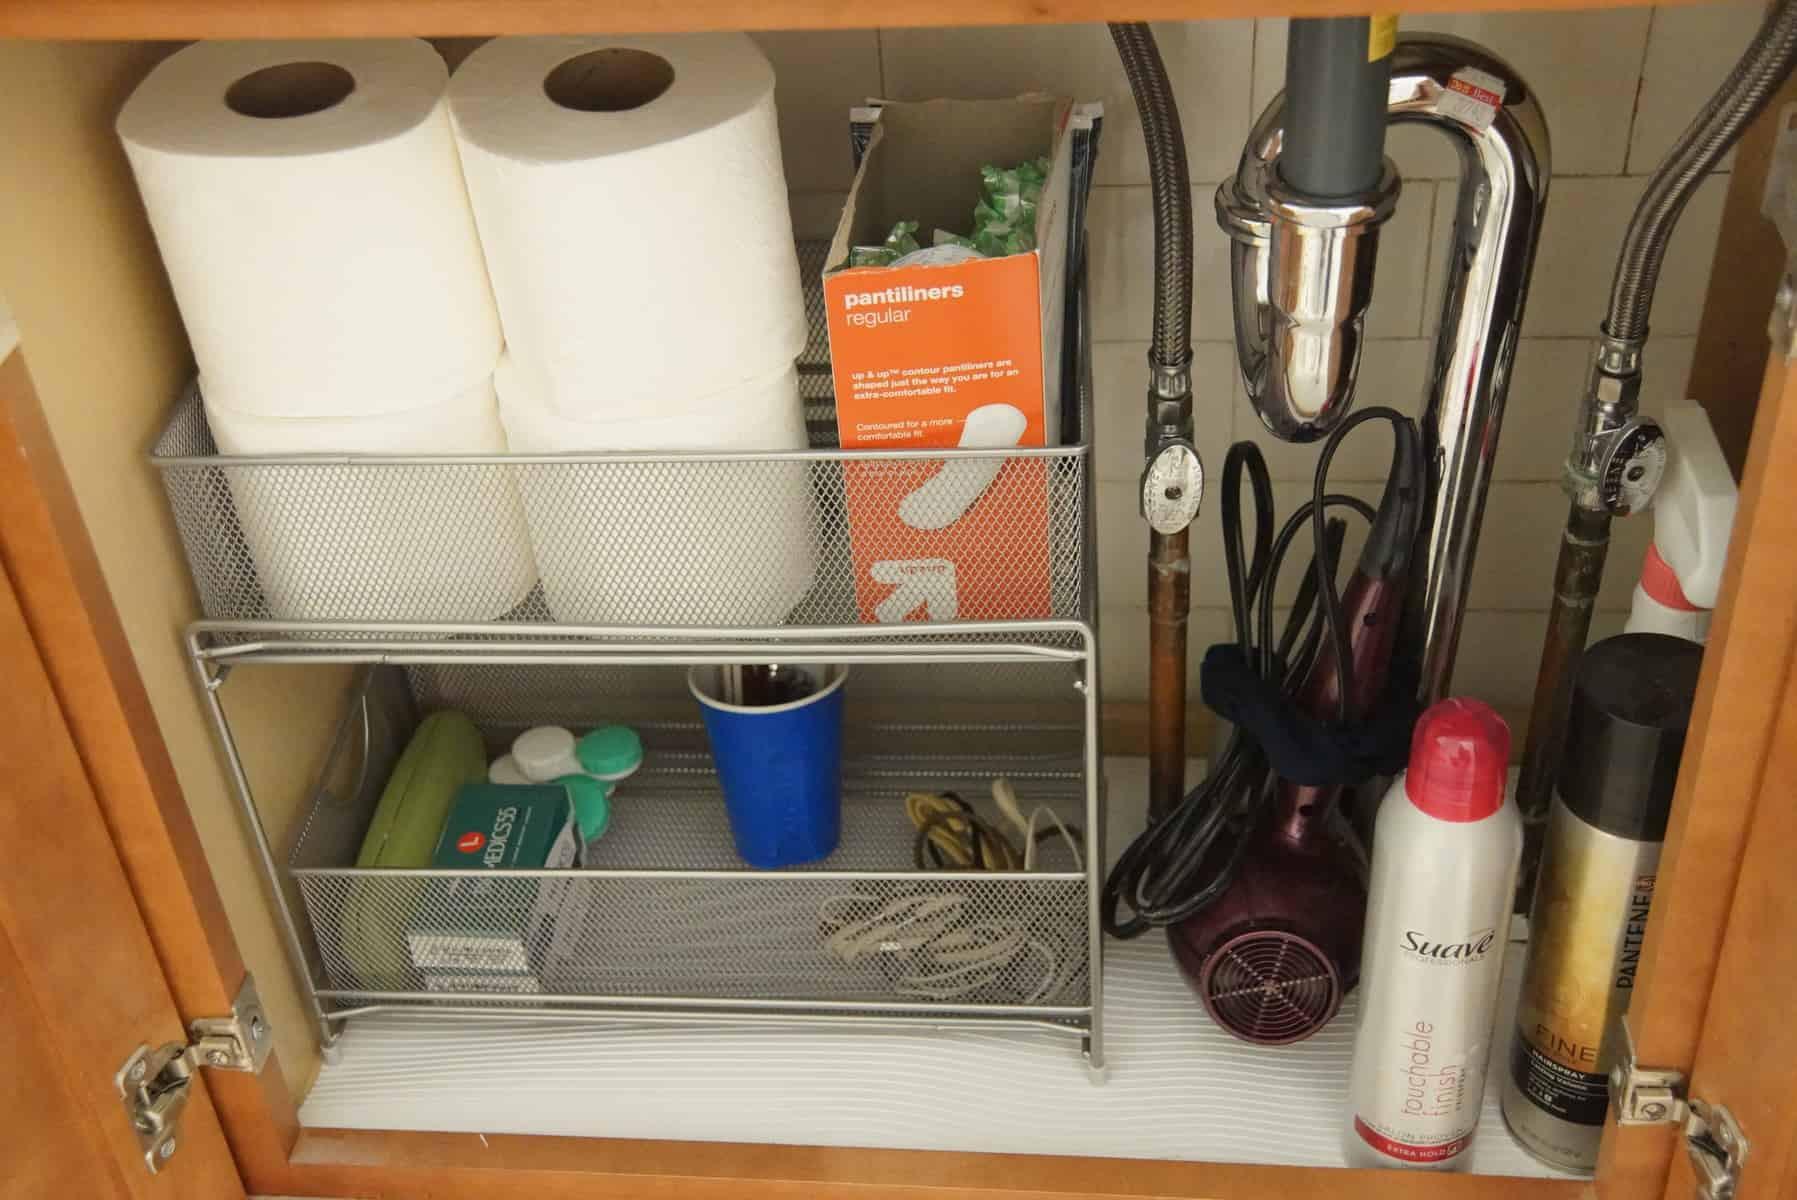 Best ideas about Bathroom Sink Organizer . Save or Pin Organizing Under Bathroom Sinks Now.